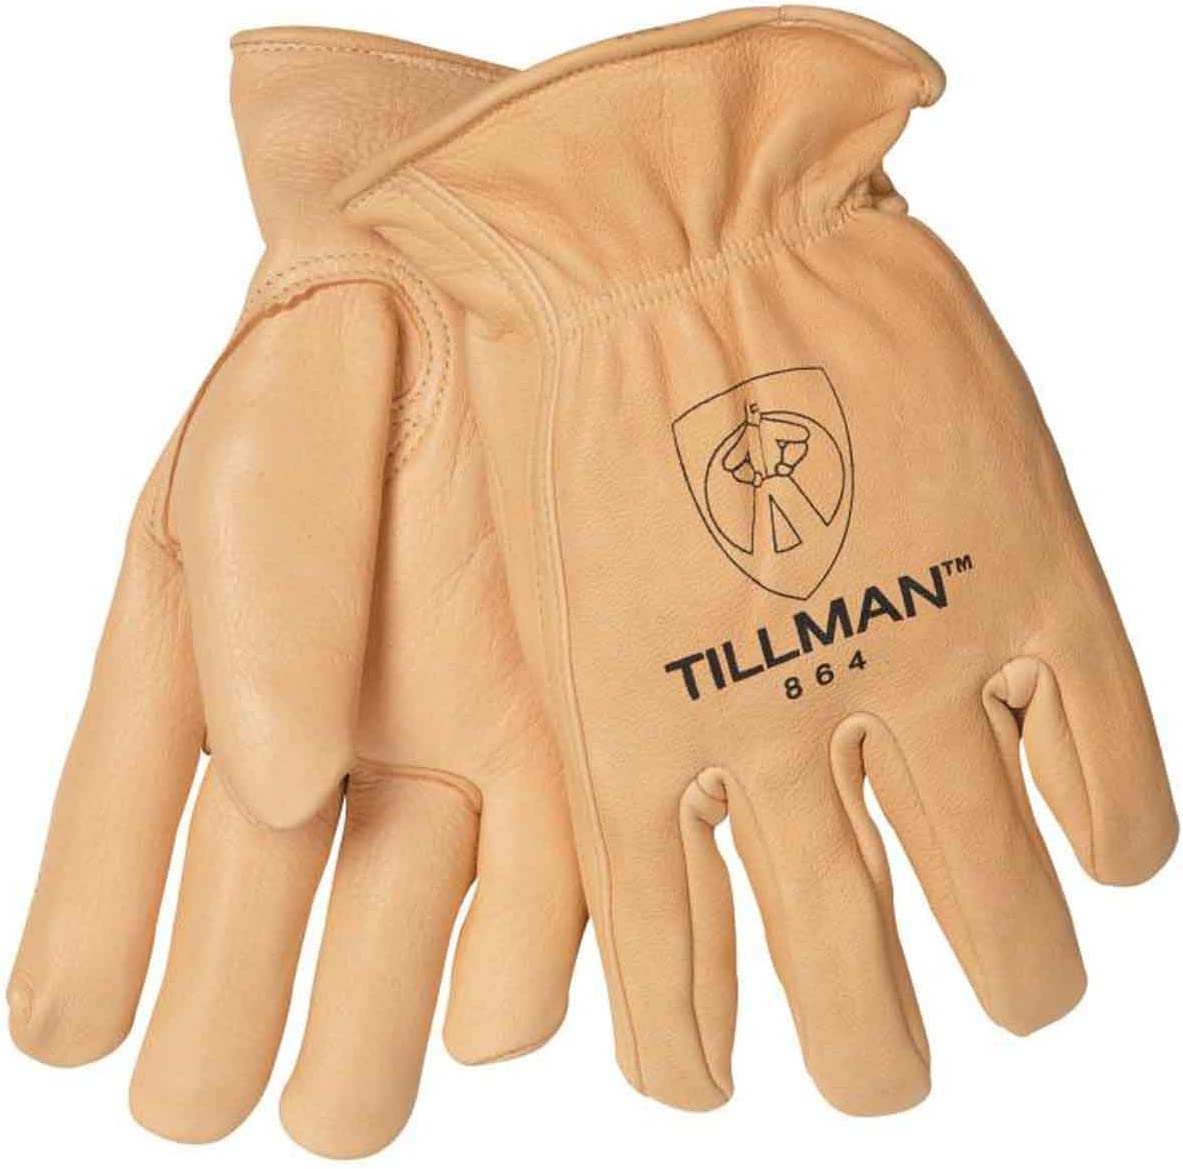 Tillman 864 Dealing full Long-awaited price reduction Premium Top Grain Gloves Unlined Deerskin Drivers